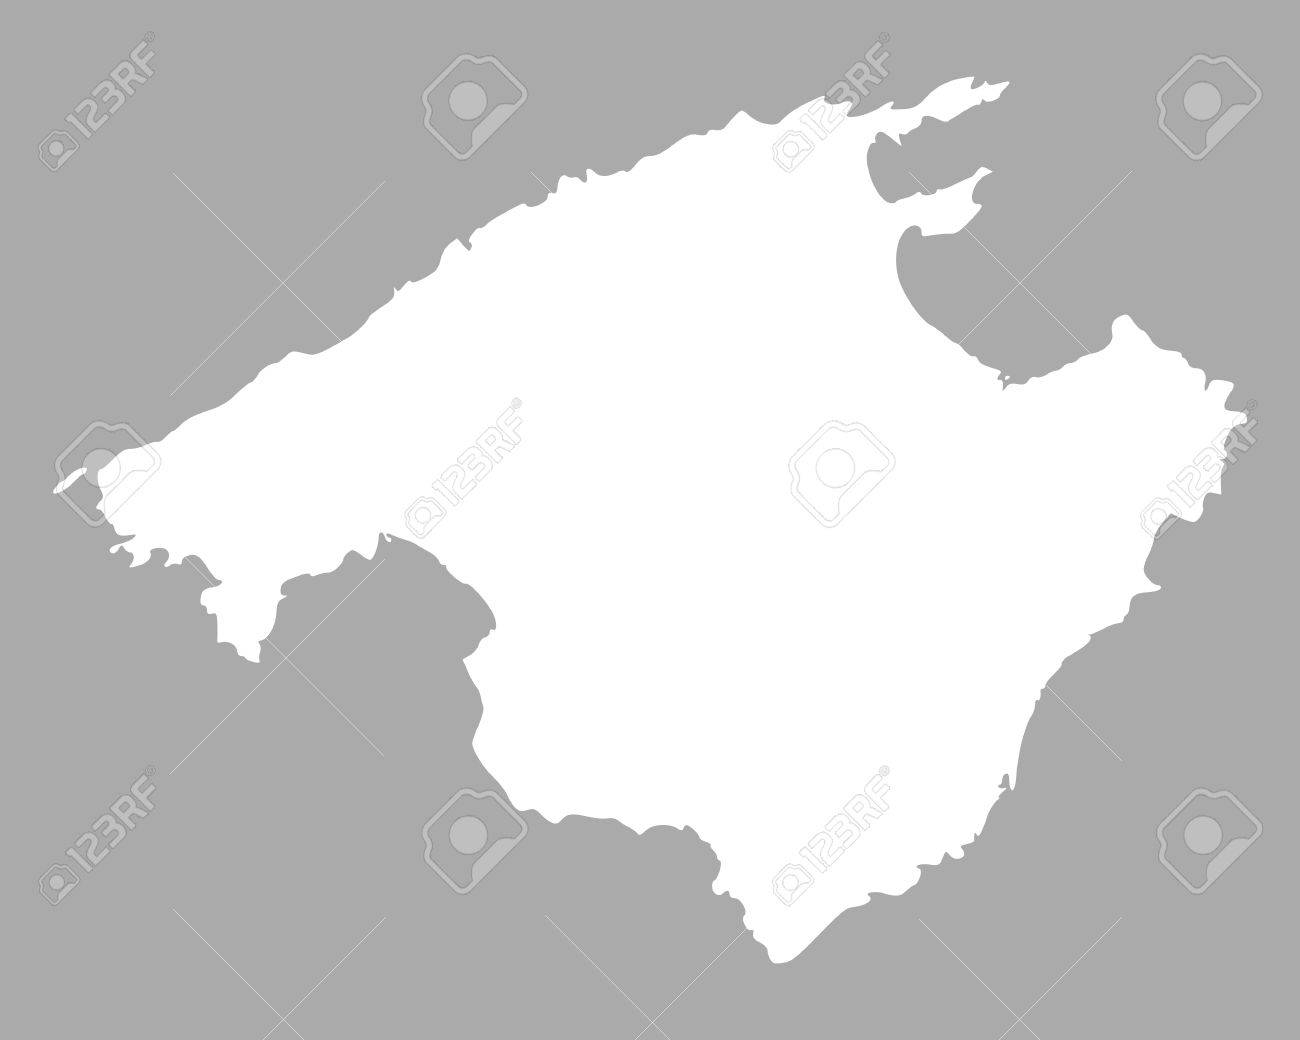 Map of Mallorca Mallorca Map on malta map, catalonia independence map, mediterranean sea map, barcelona map, canary islands map, palma map, world map, menorca map, lanzarote map, hong kong map, pyrenees mountains map, copenhagen map, naples map, majorca map, croatia map, ibiza map, malaga map, poland map, marseille map,